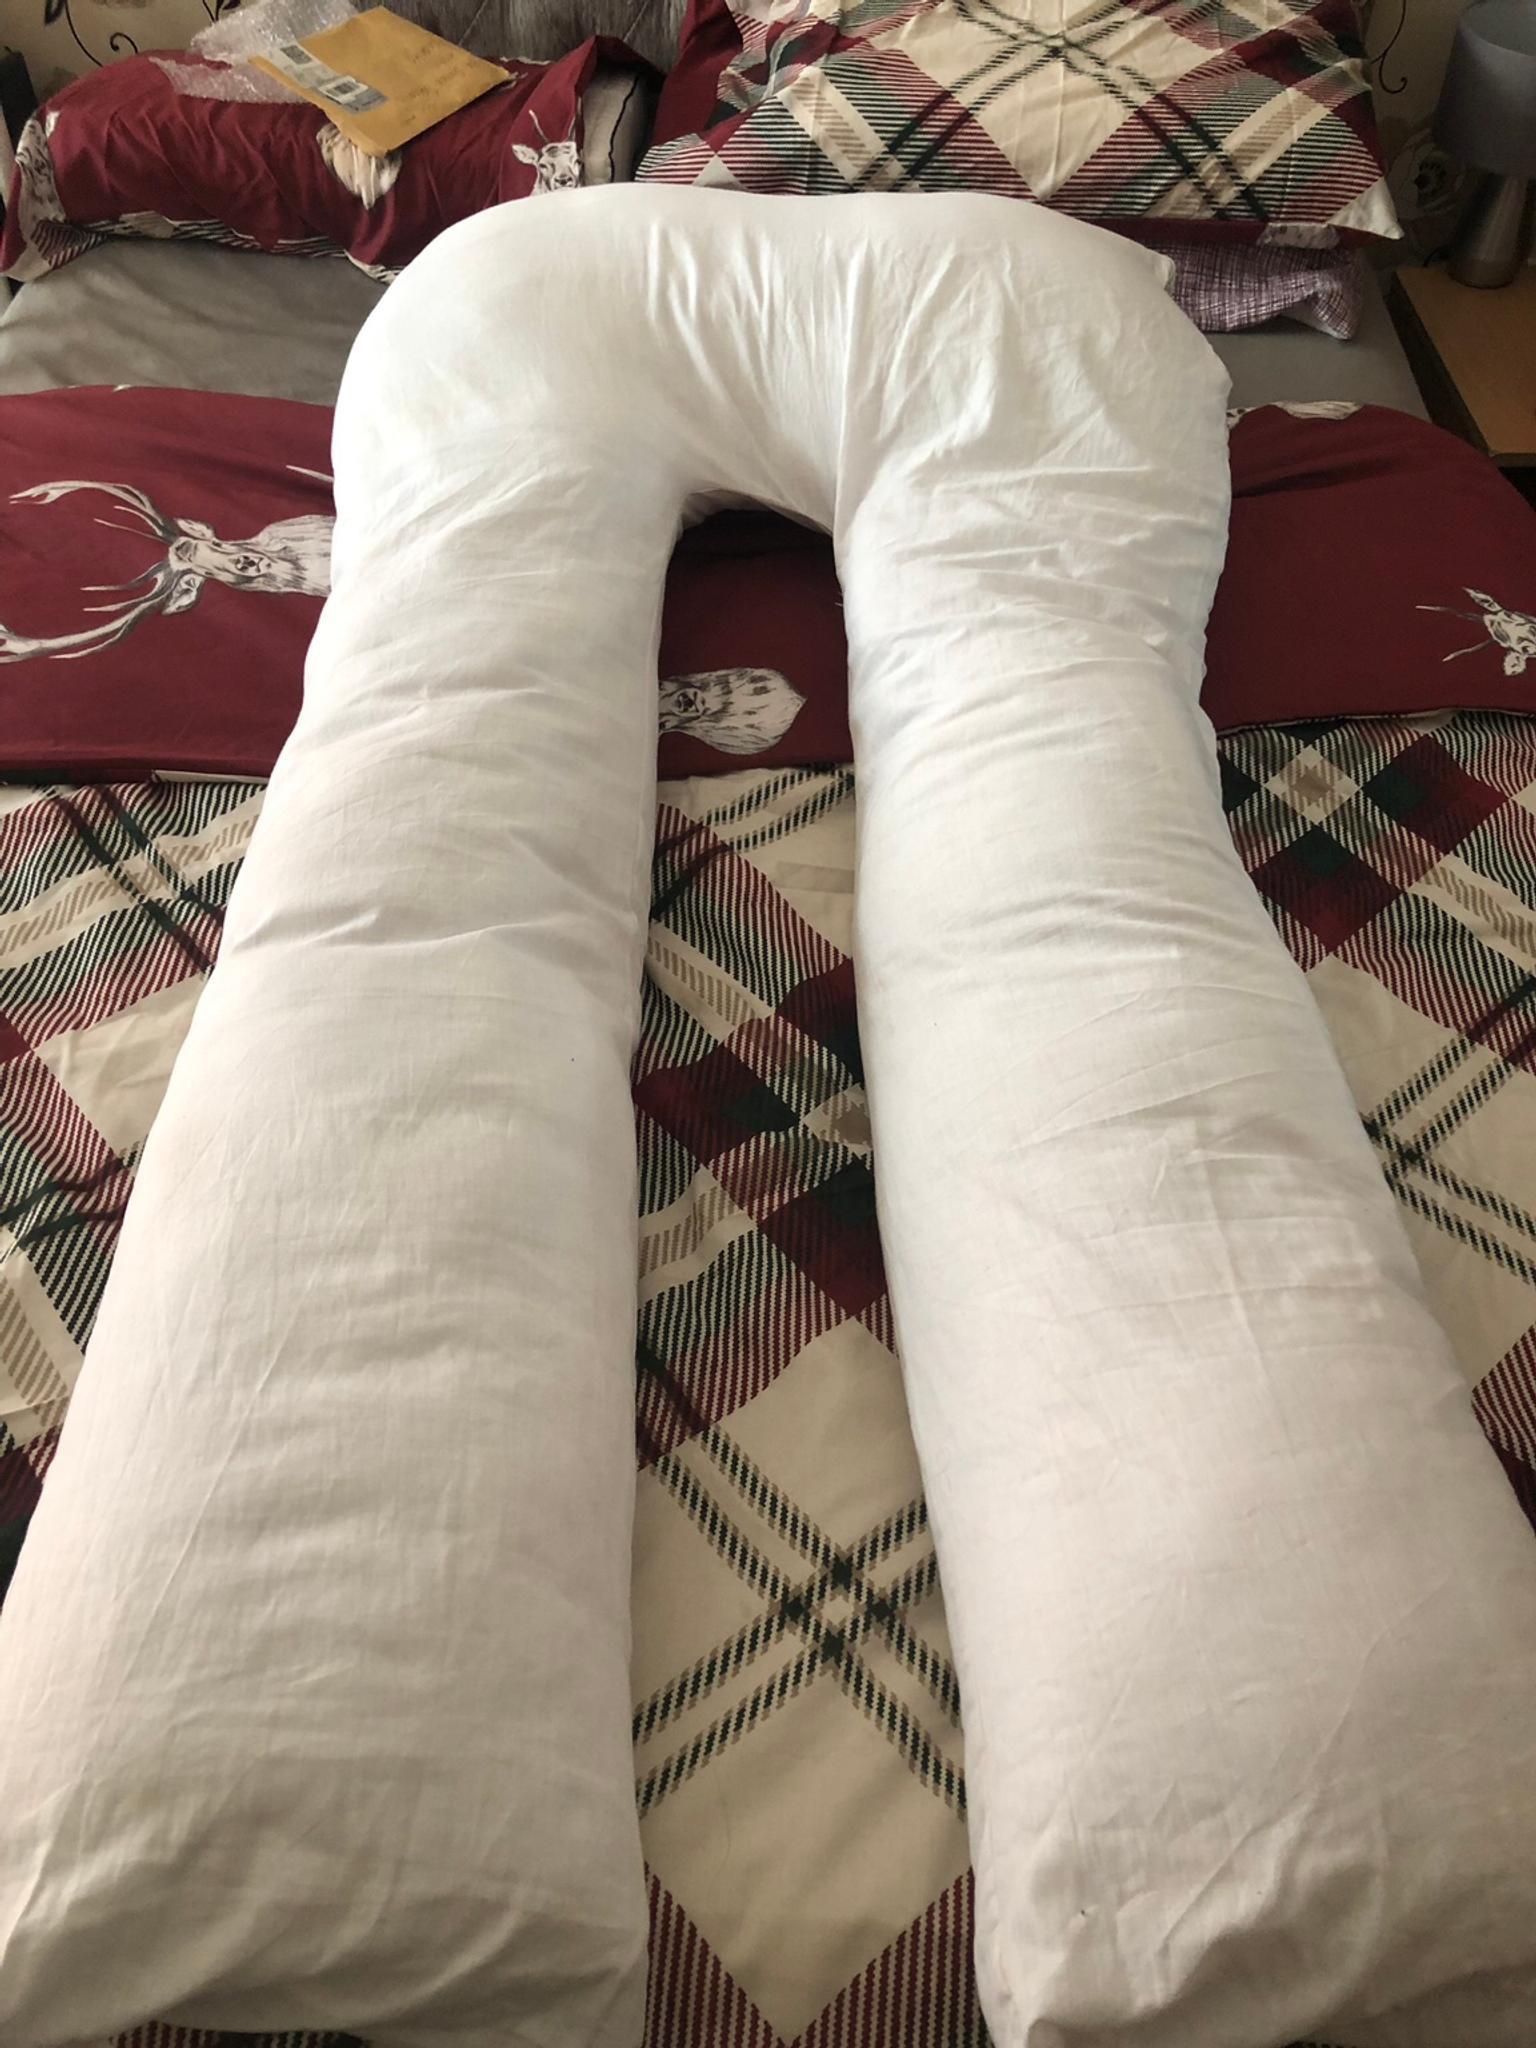 cuddle pillow large size